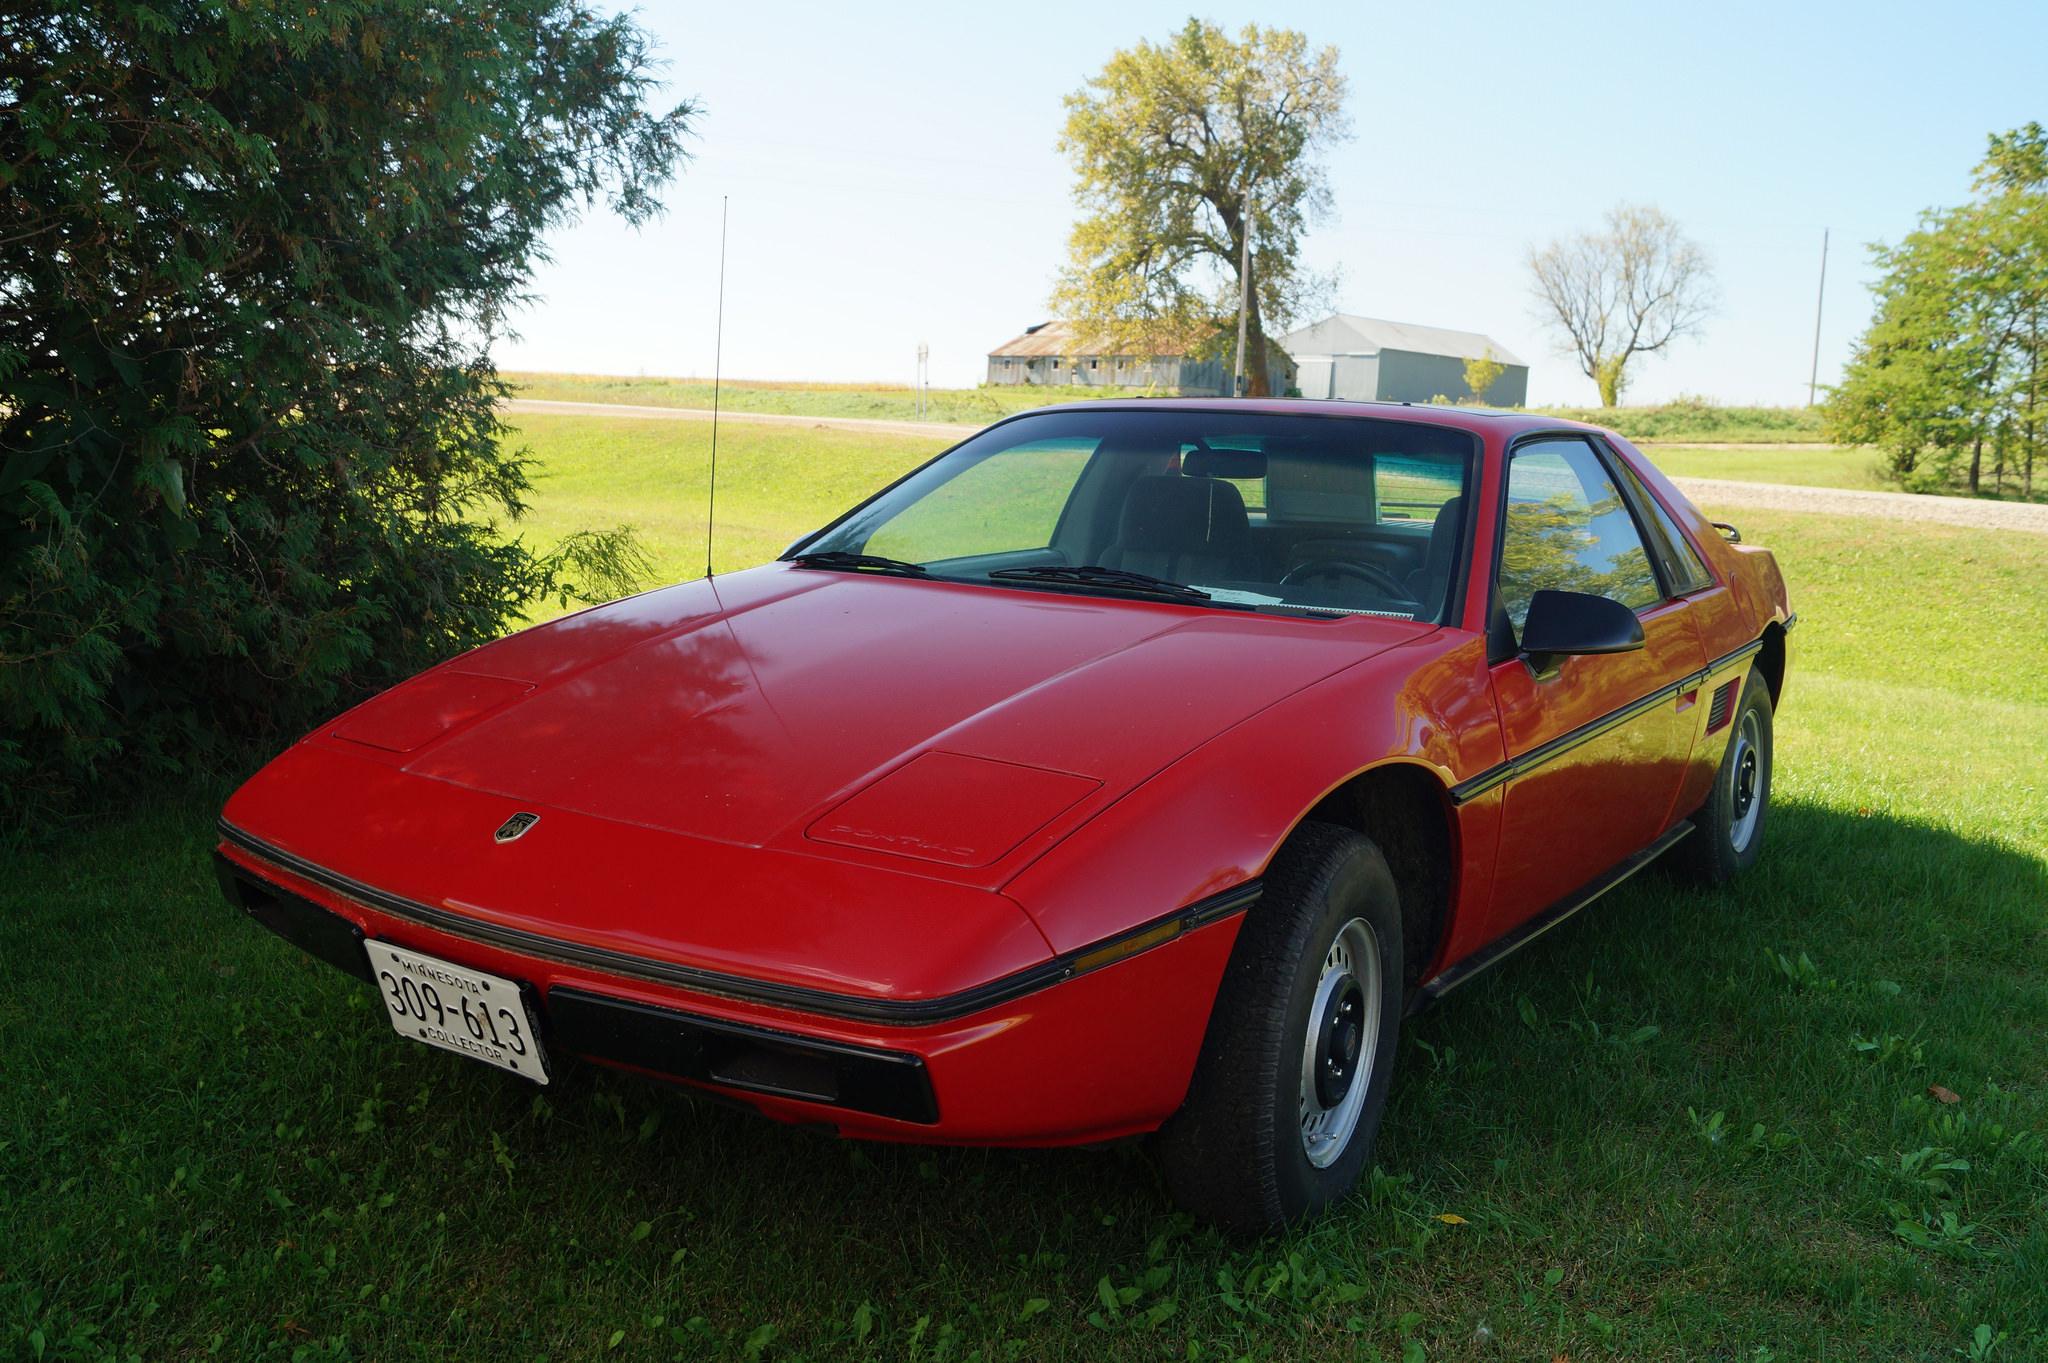 Automóvil Pontiac modelo Fiero